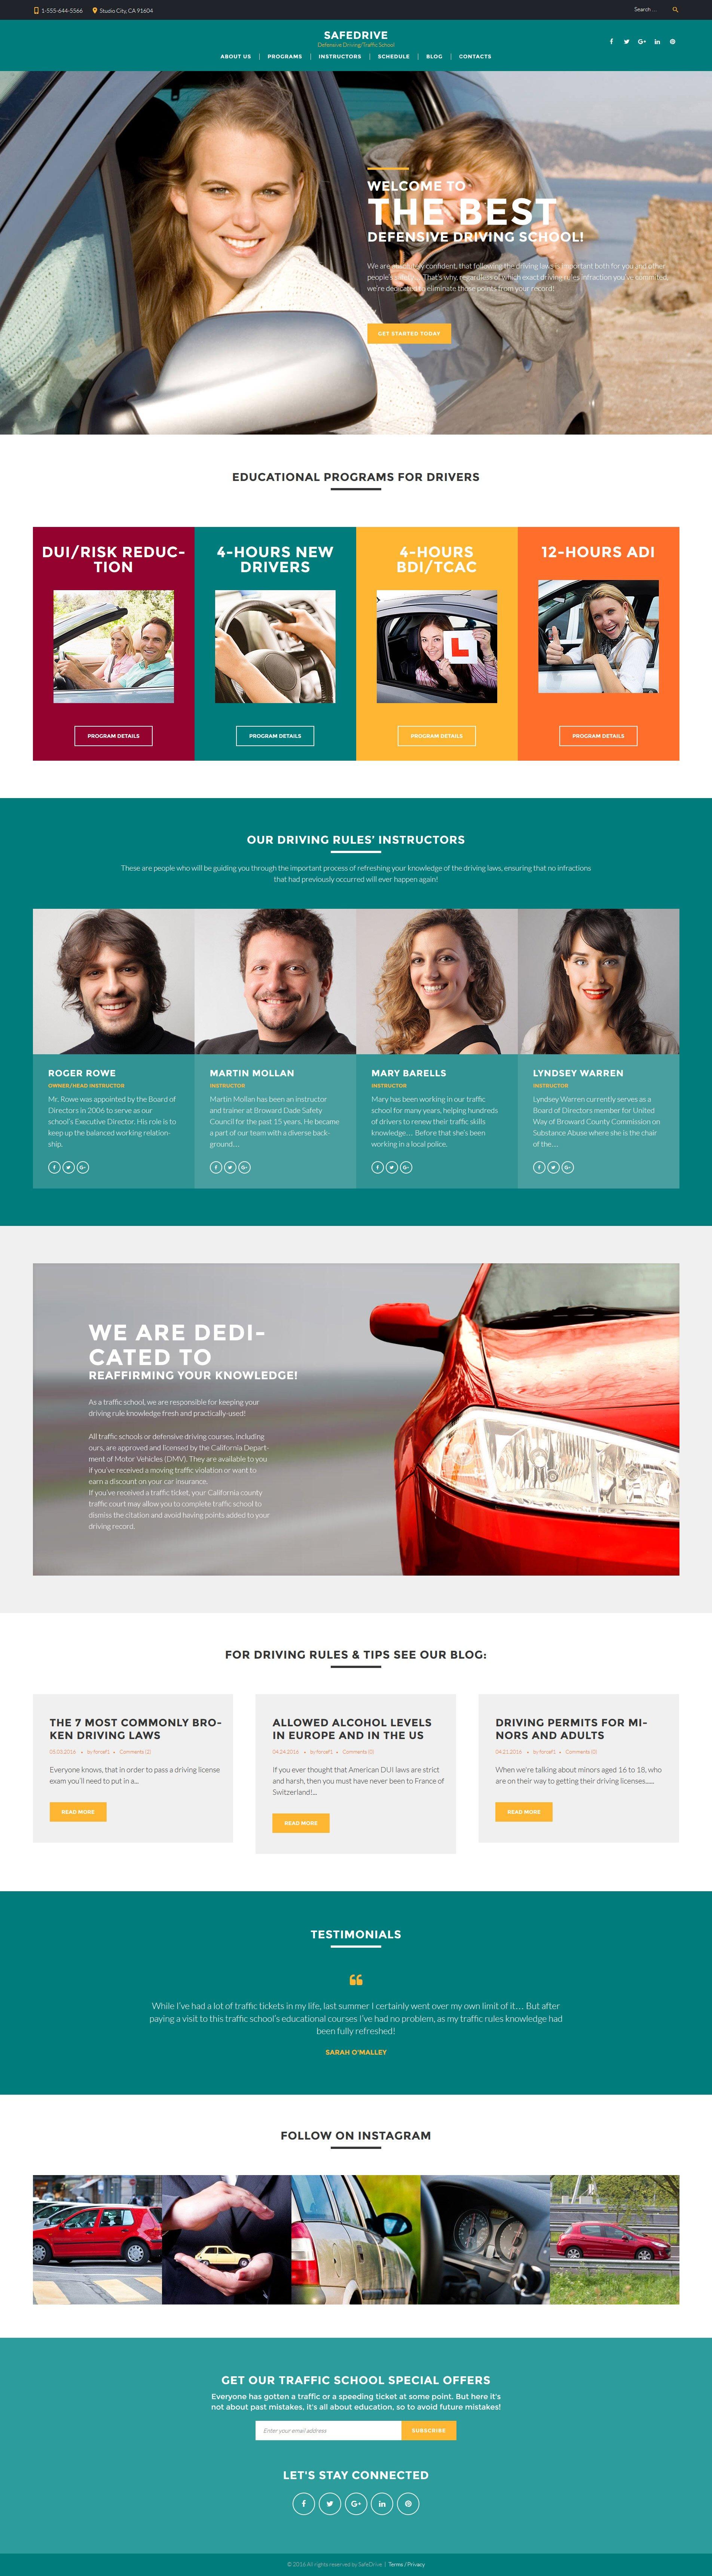 SafeDrive - Driving School Responsive Tema WordPress №60127